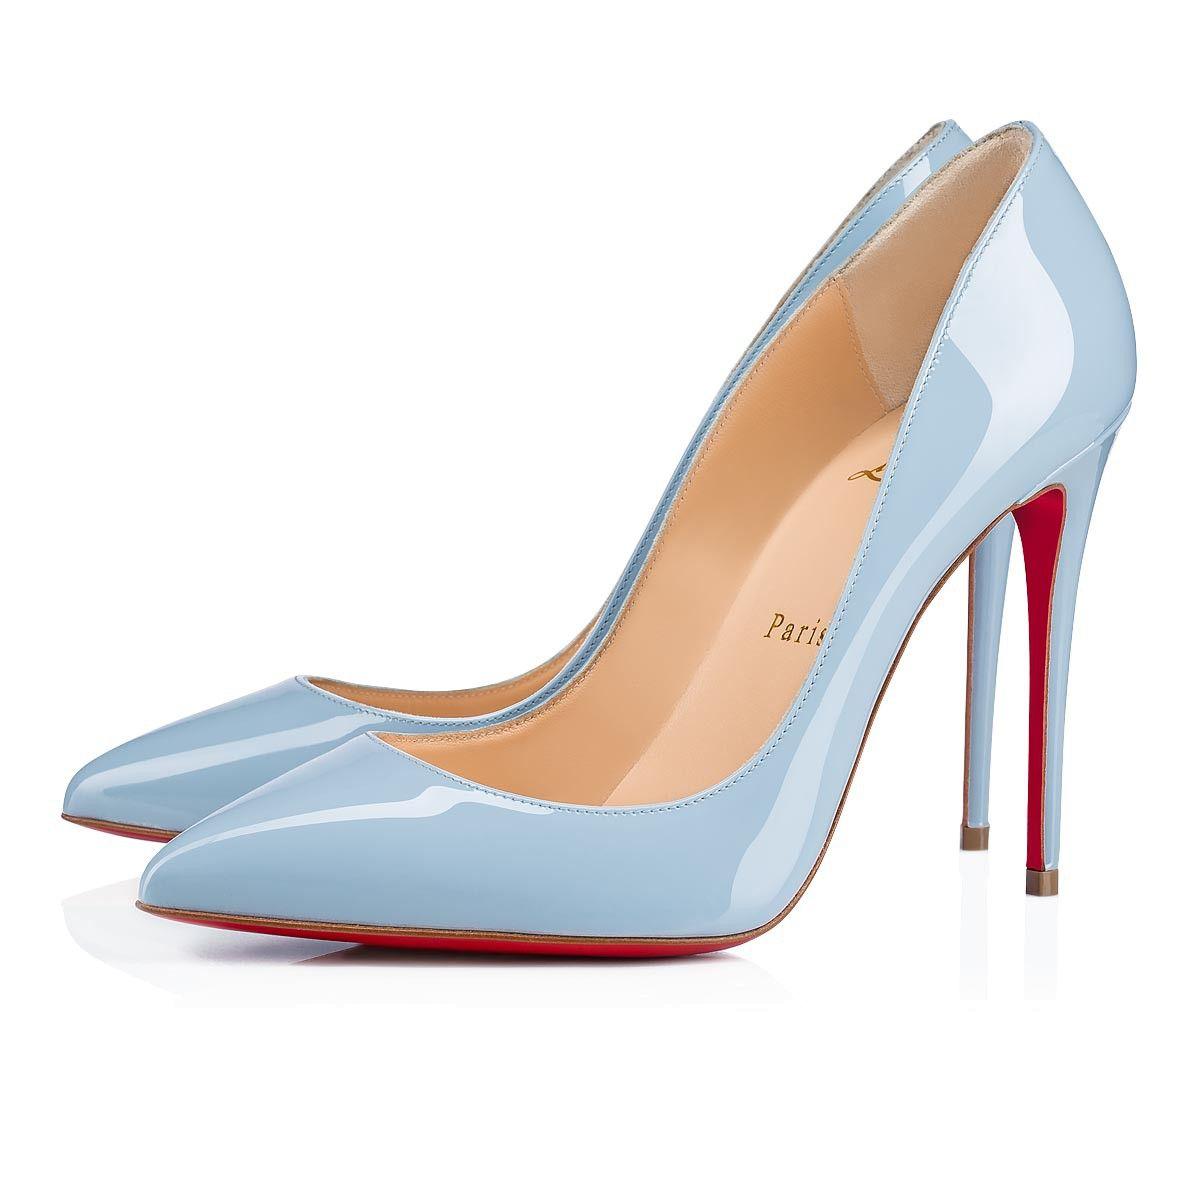 d409e8588503 Pigalle Follies 100 Sky Patent Leather - Women Shoes - Christian Louboutin